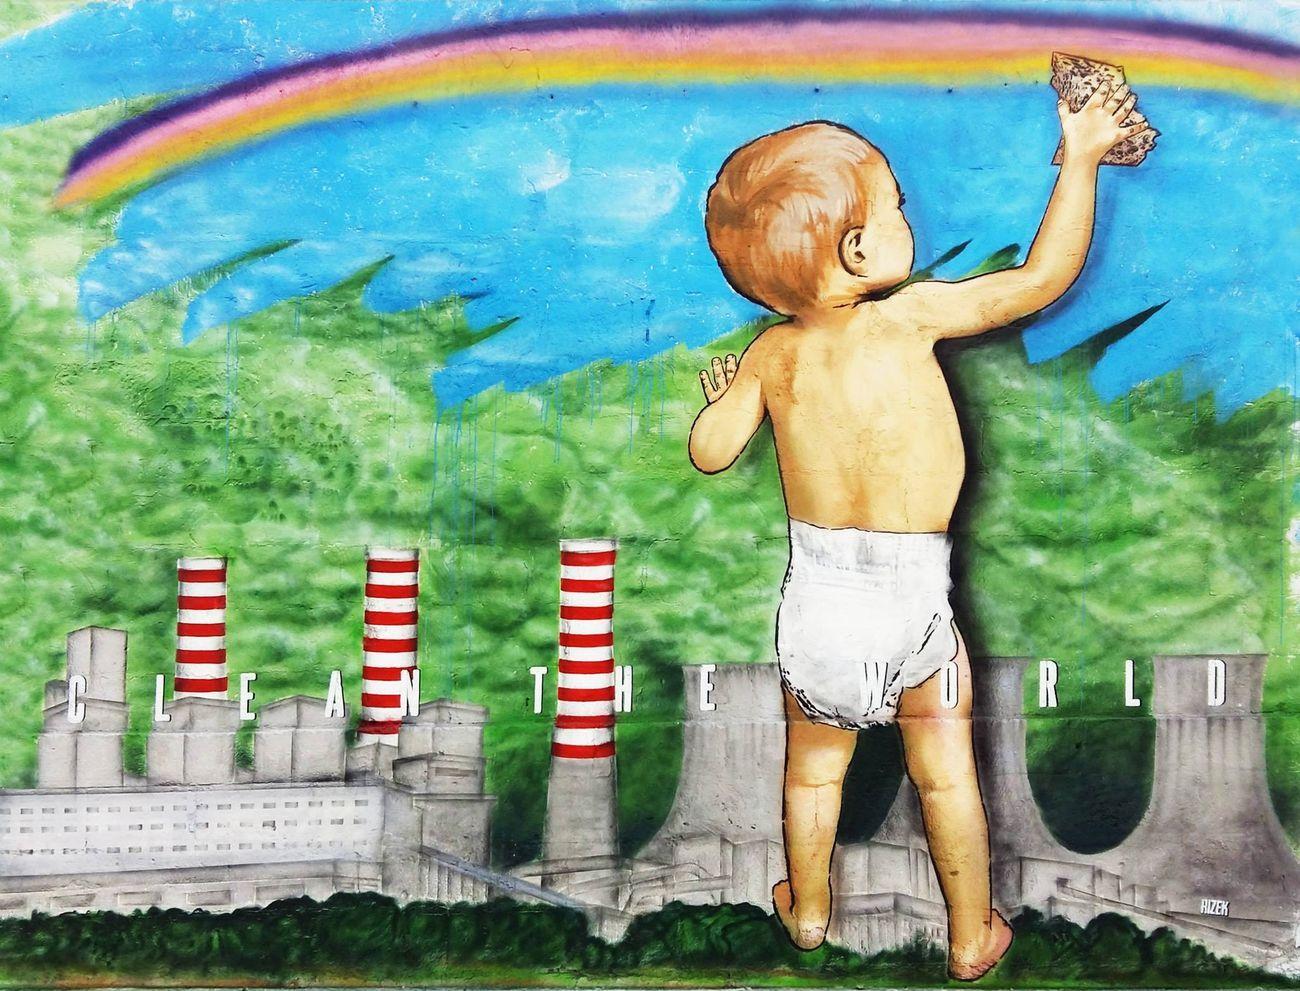 Rizek, Clean the World, Street Like a Rainbow, Castellaneta, 2015